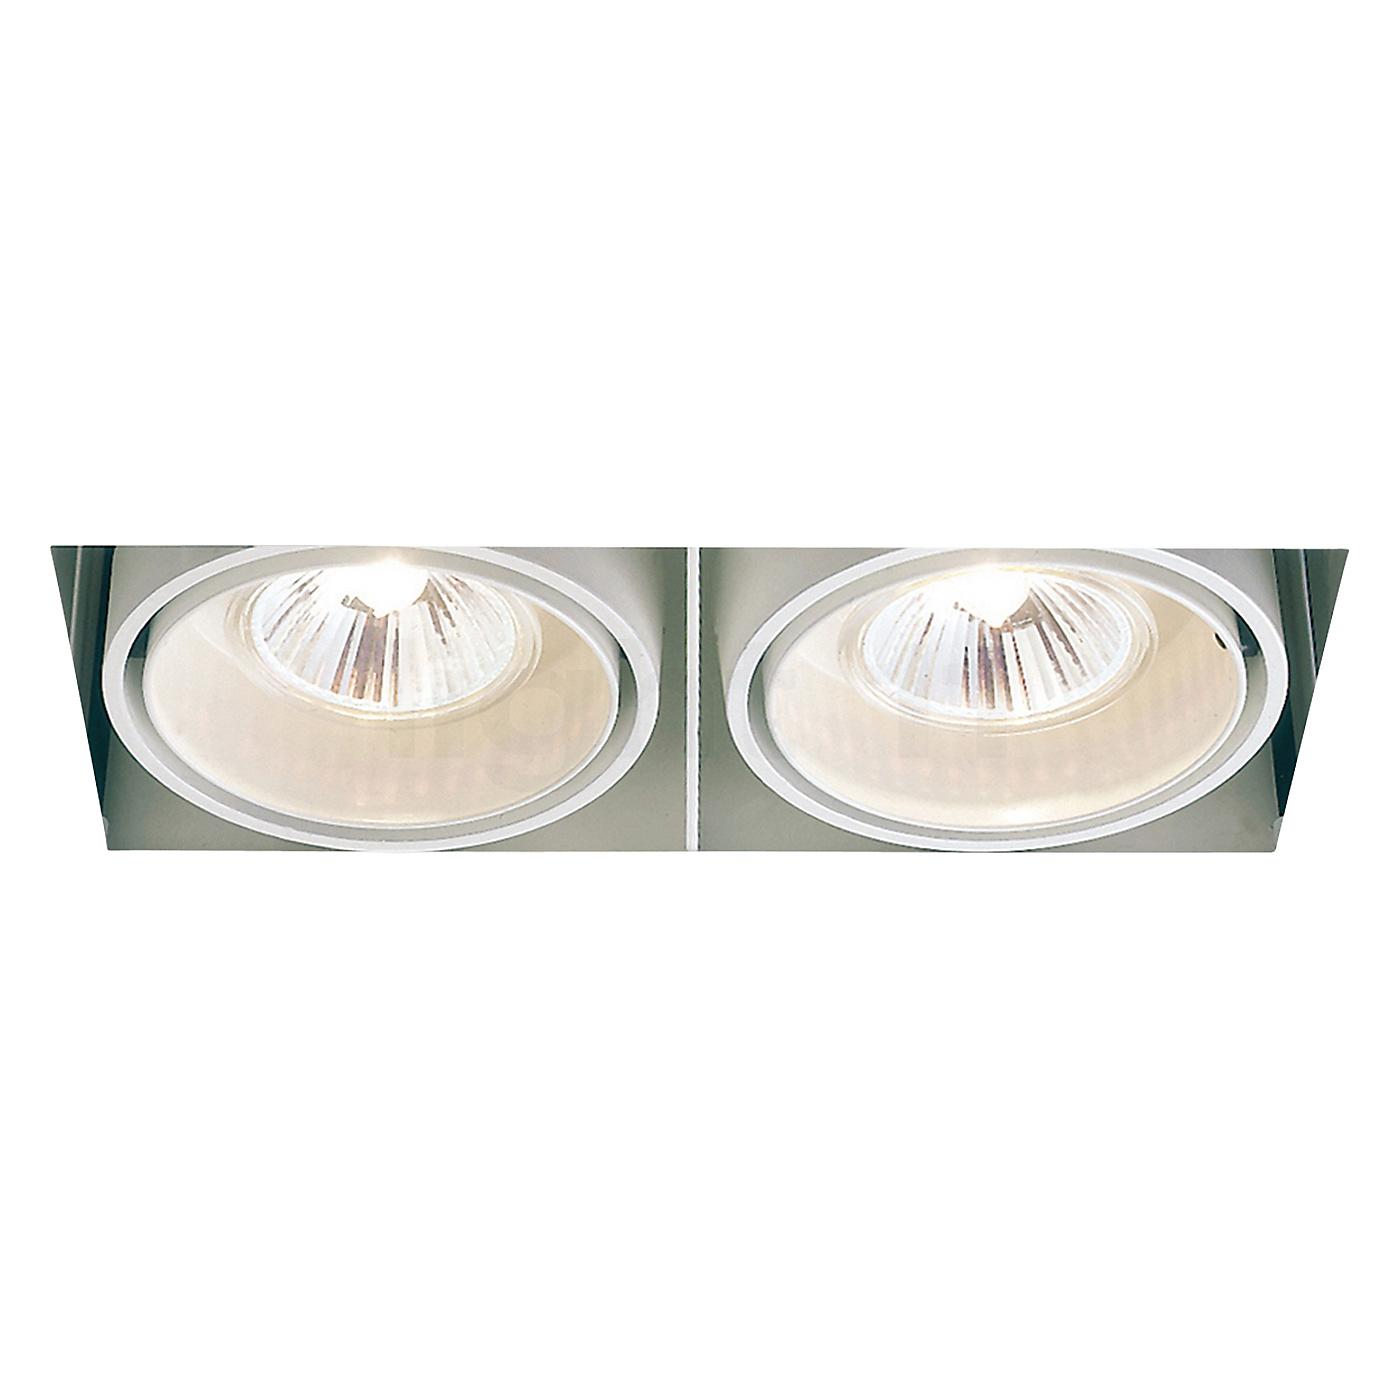 delta light minigrid in trimless 2 50 hi. Black Bedroom Furniture Sets. Home Design Ideas